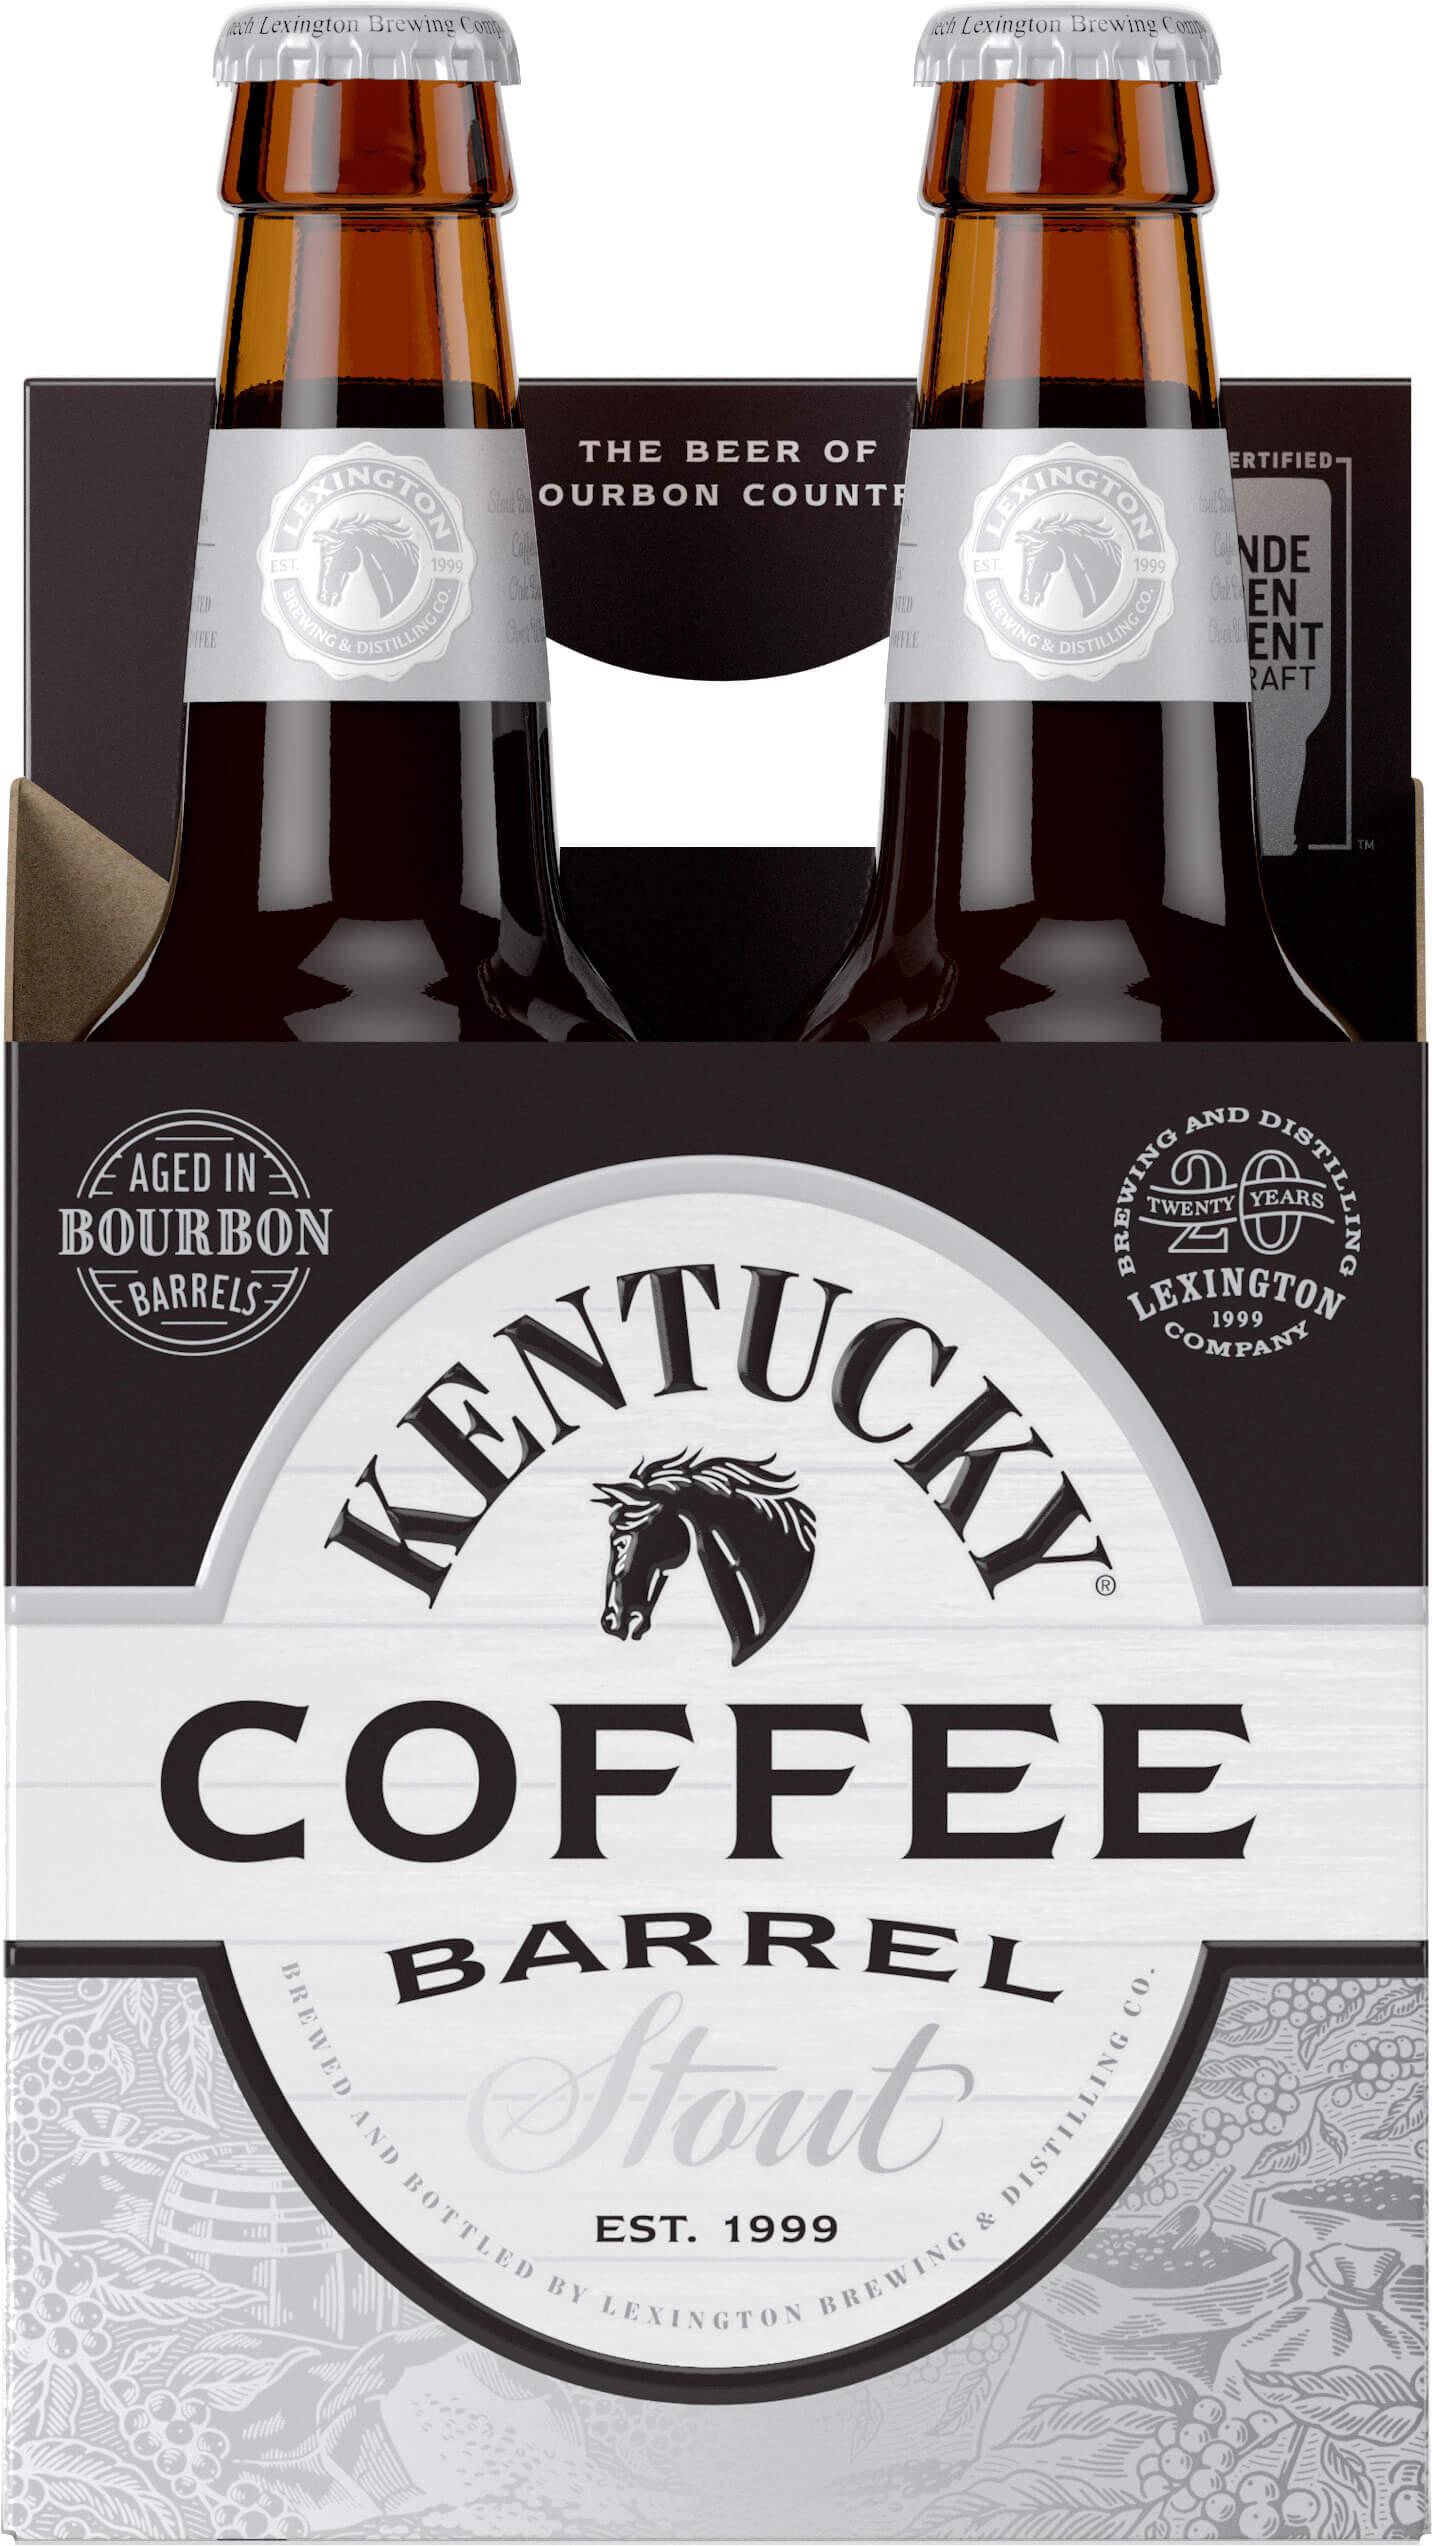 Packaging art for the Kentucky Coffee Barrel Stout by Alltech Lexington Brewing & Distilling Co.